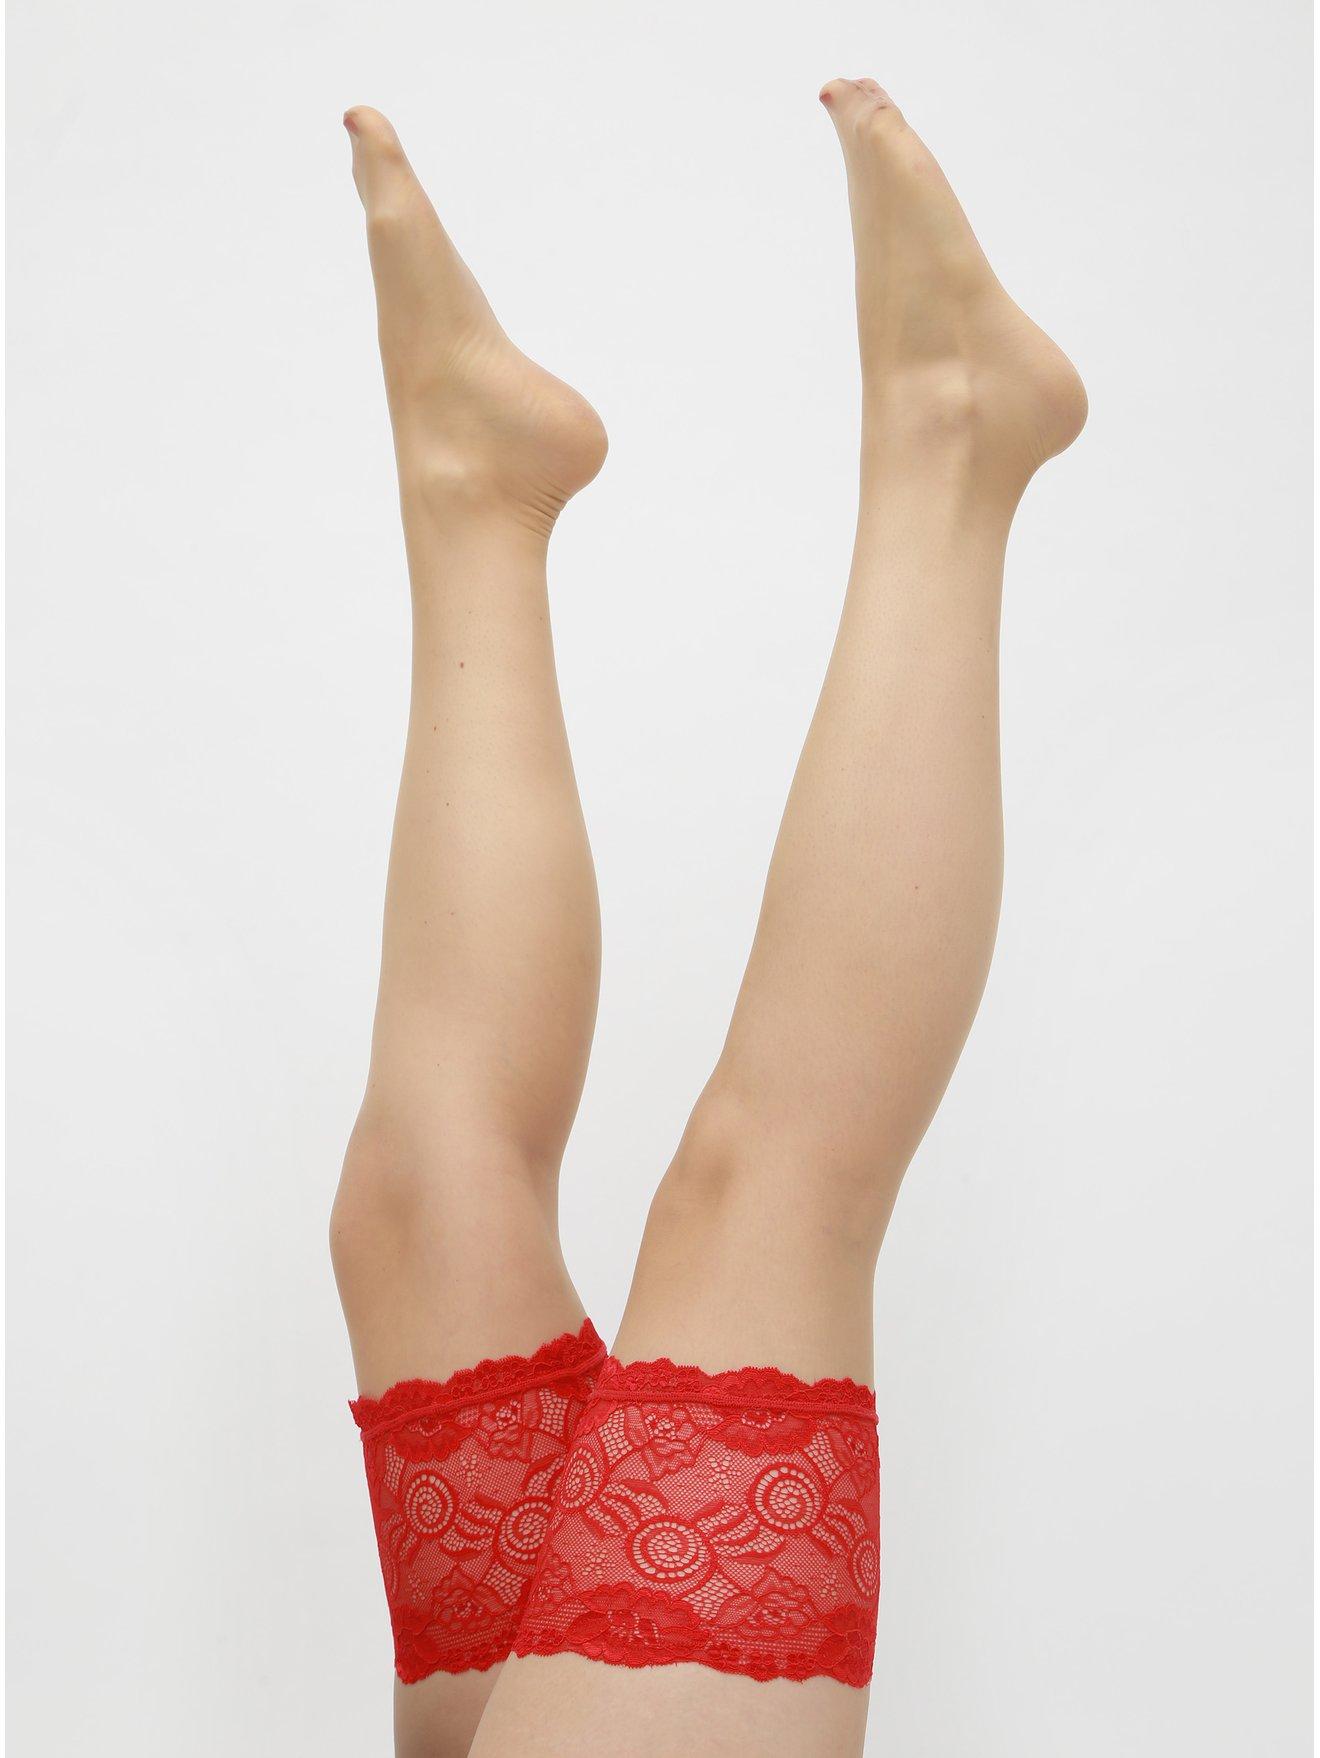 Fotografie Punčochy s červenou krajkou Obsessive